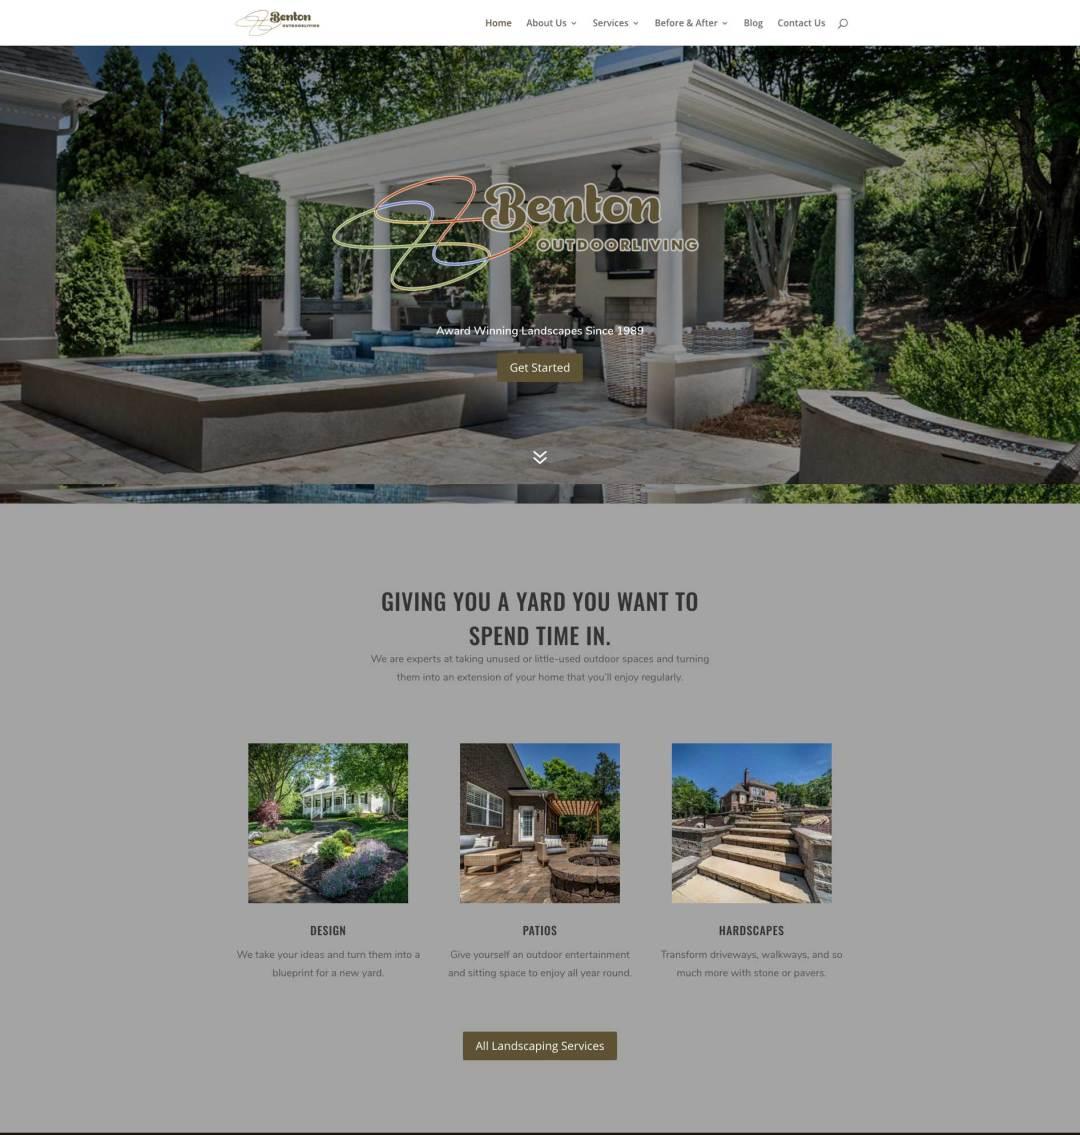 Benton Outdoor Living, Award-Winning Website Design by The Mayoros Agency in Fort Mill, Sc